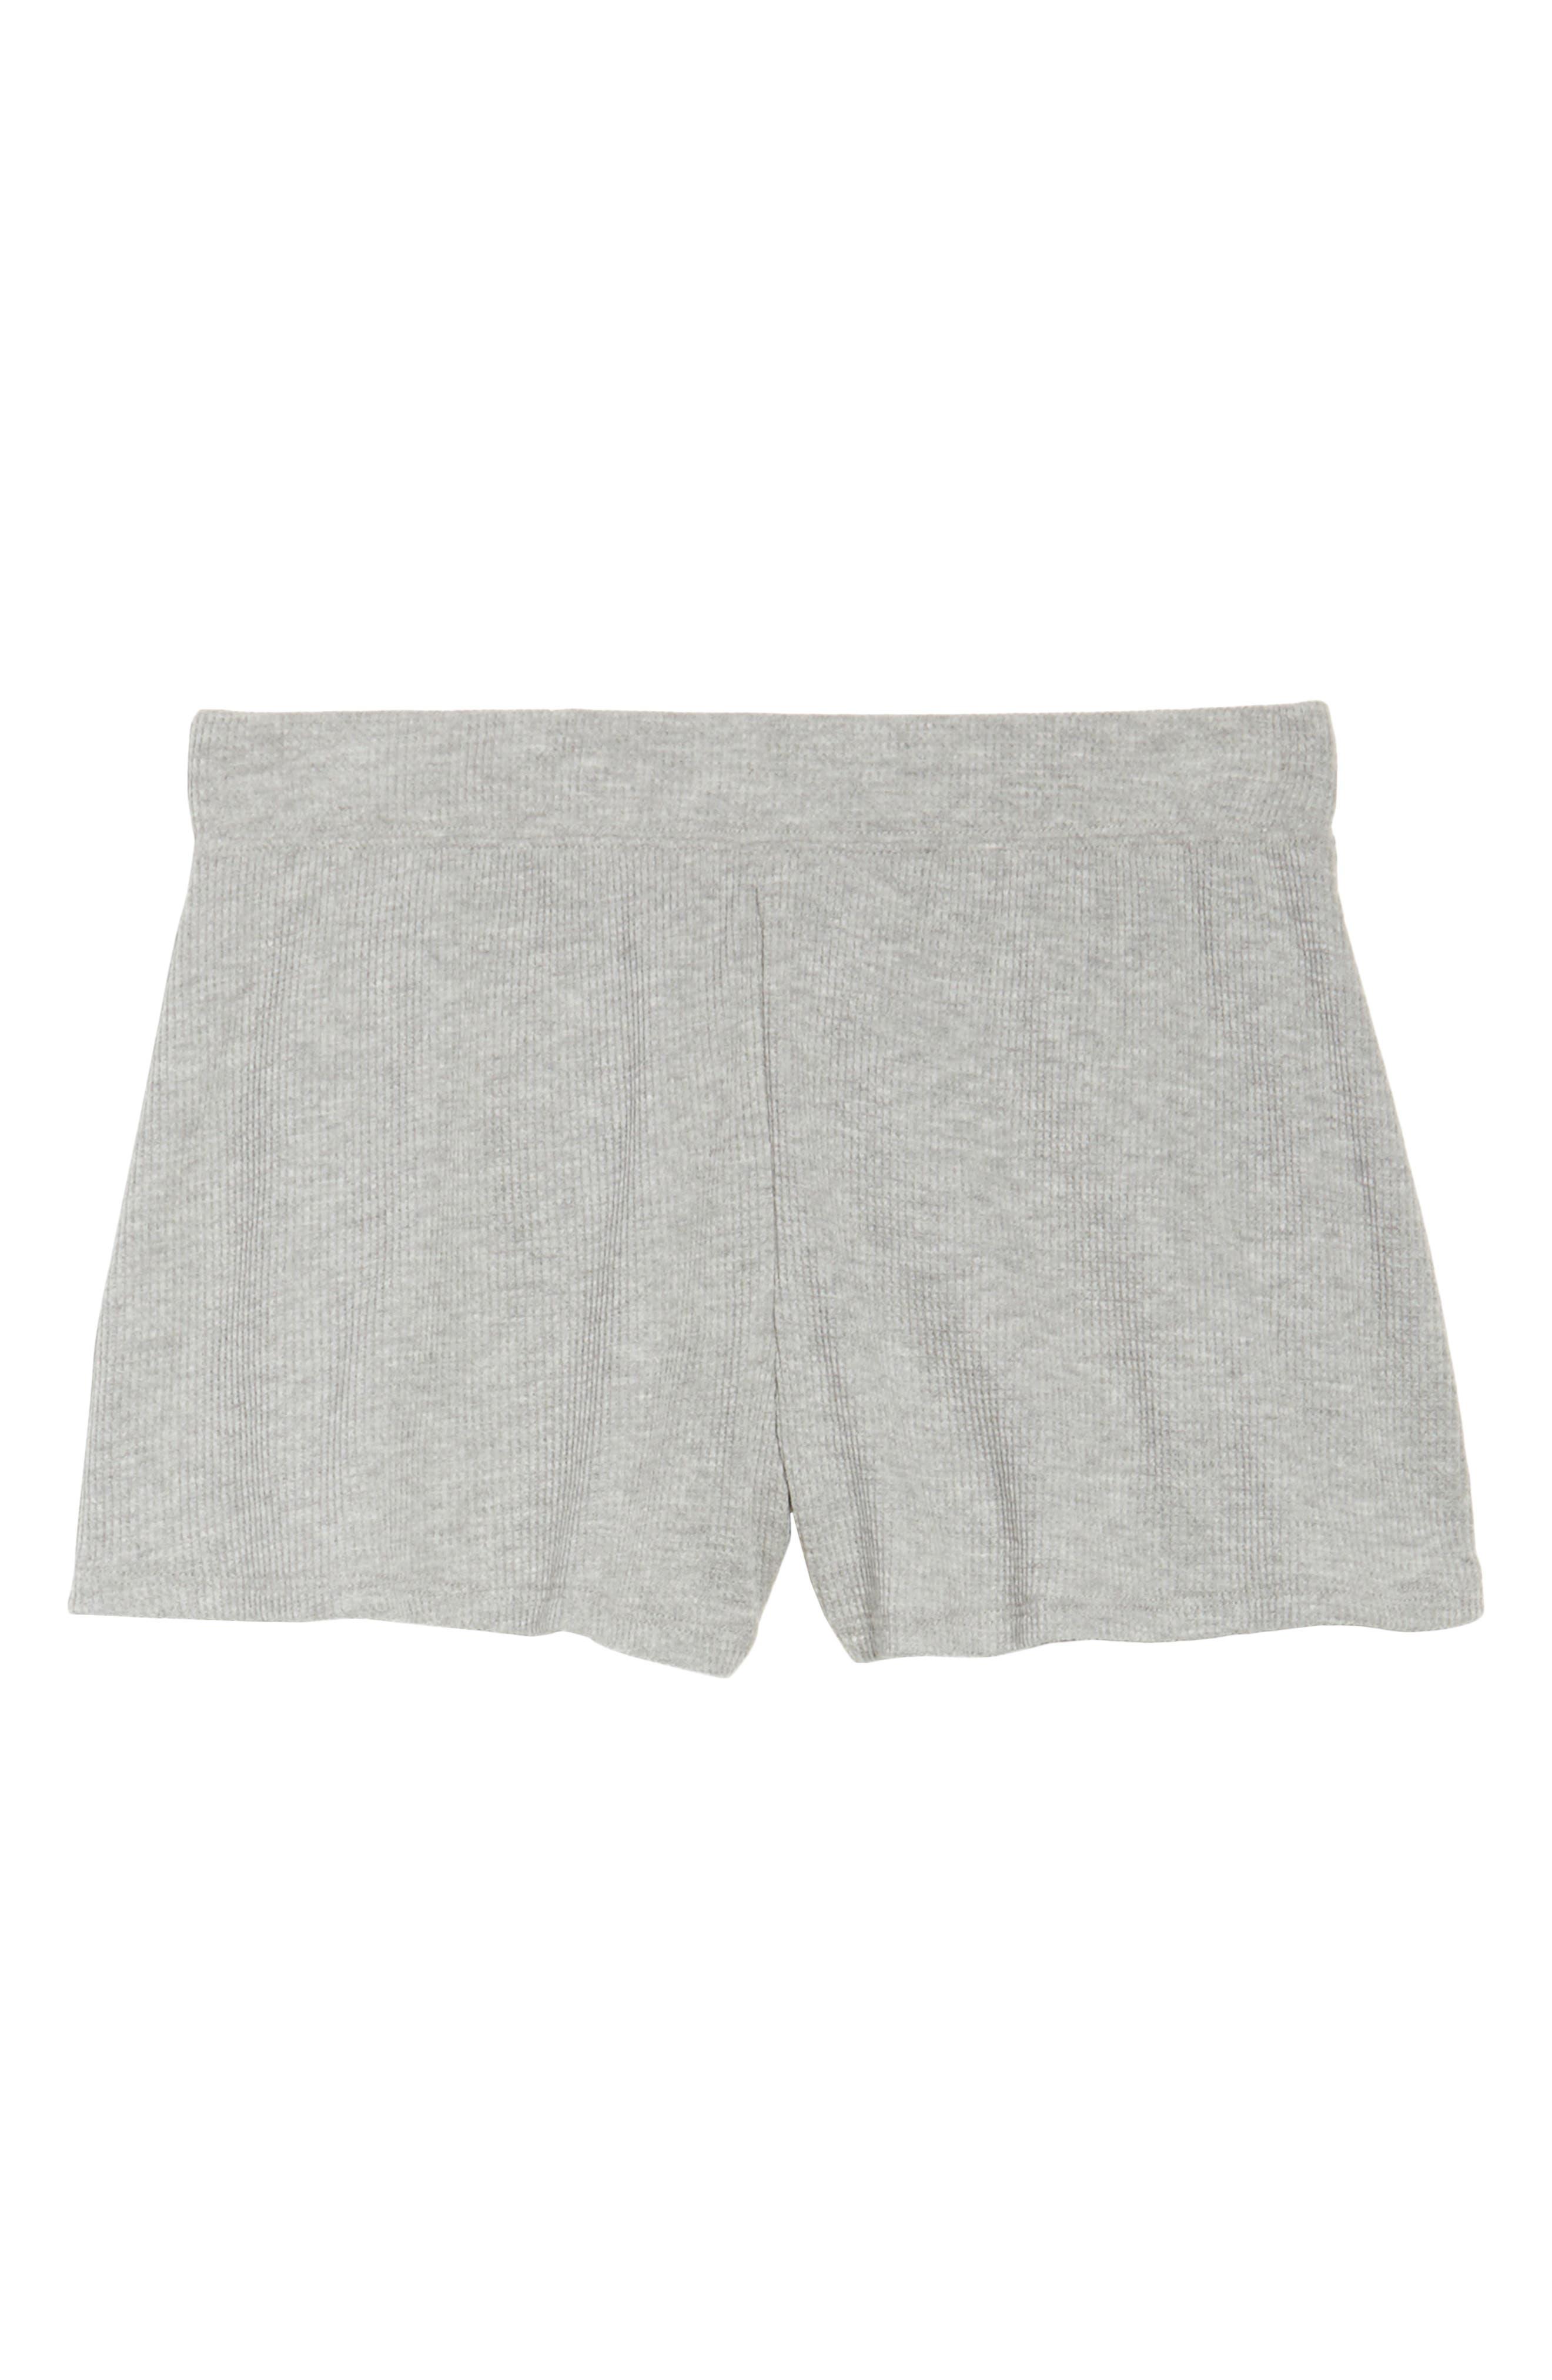 Waffle Knit Lounge Shorts,                             Alternate thumbnail 6, color,                             020